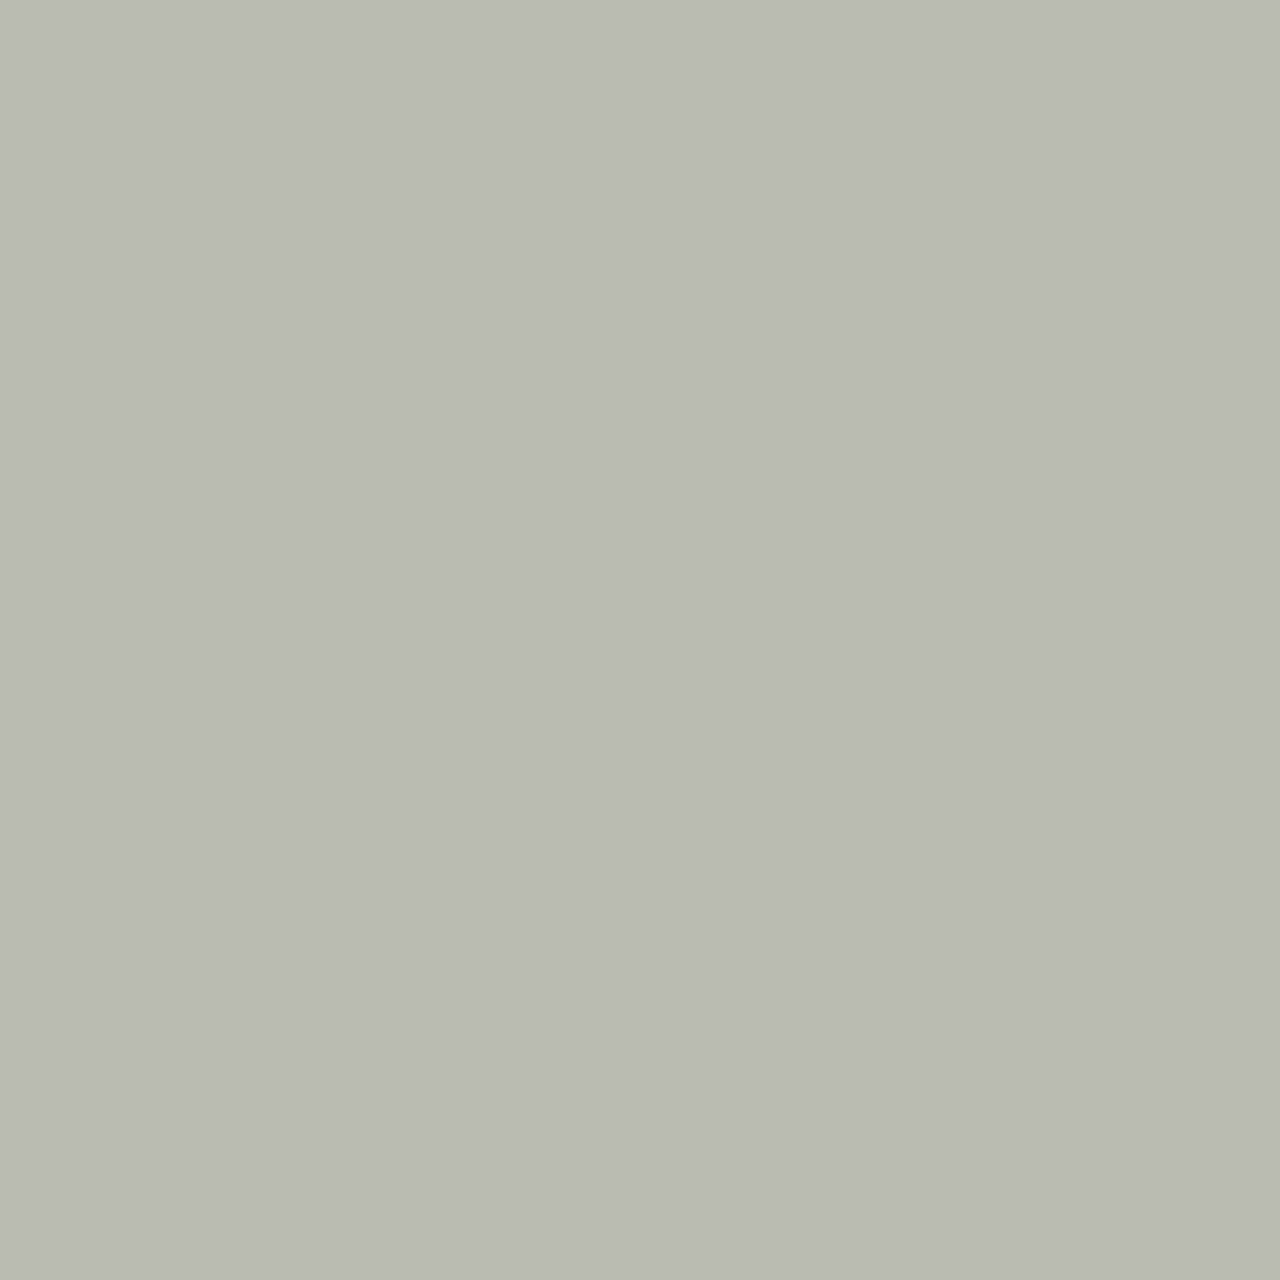 E0-02 Silver Grey